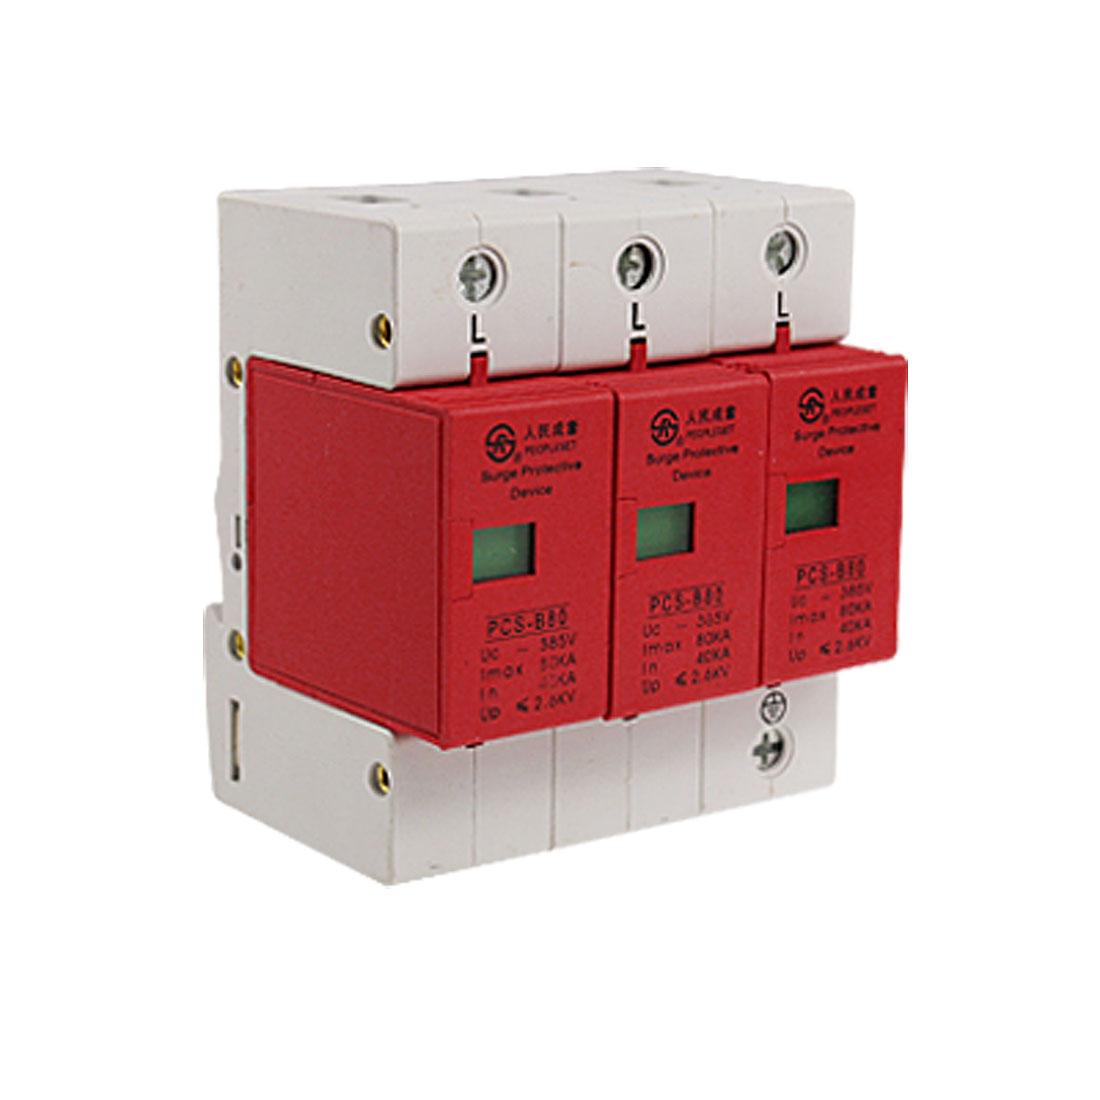 AC 385V 80KA 3P Power Supply System Protective Surge Arrester